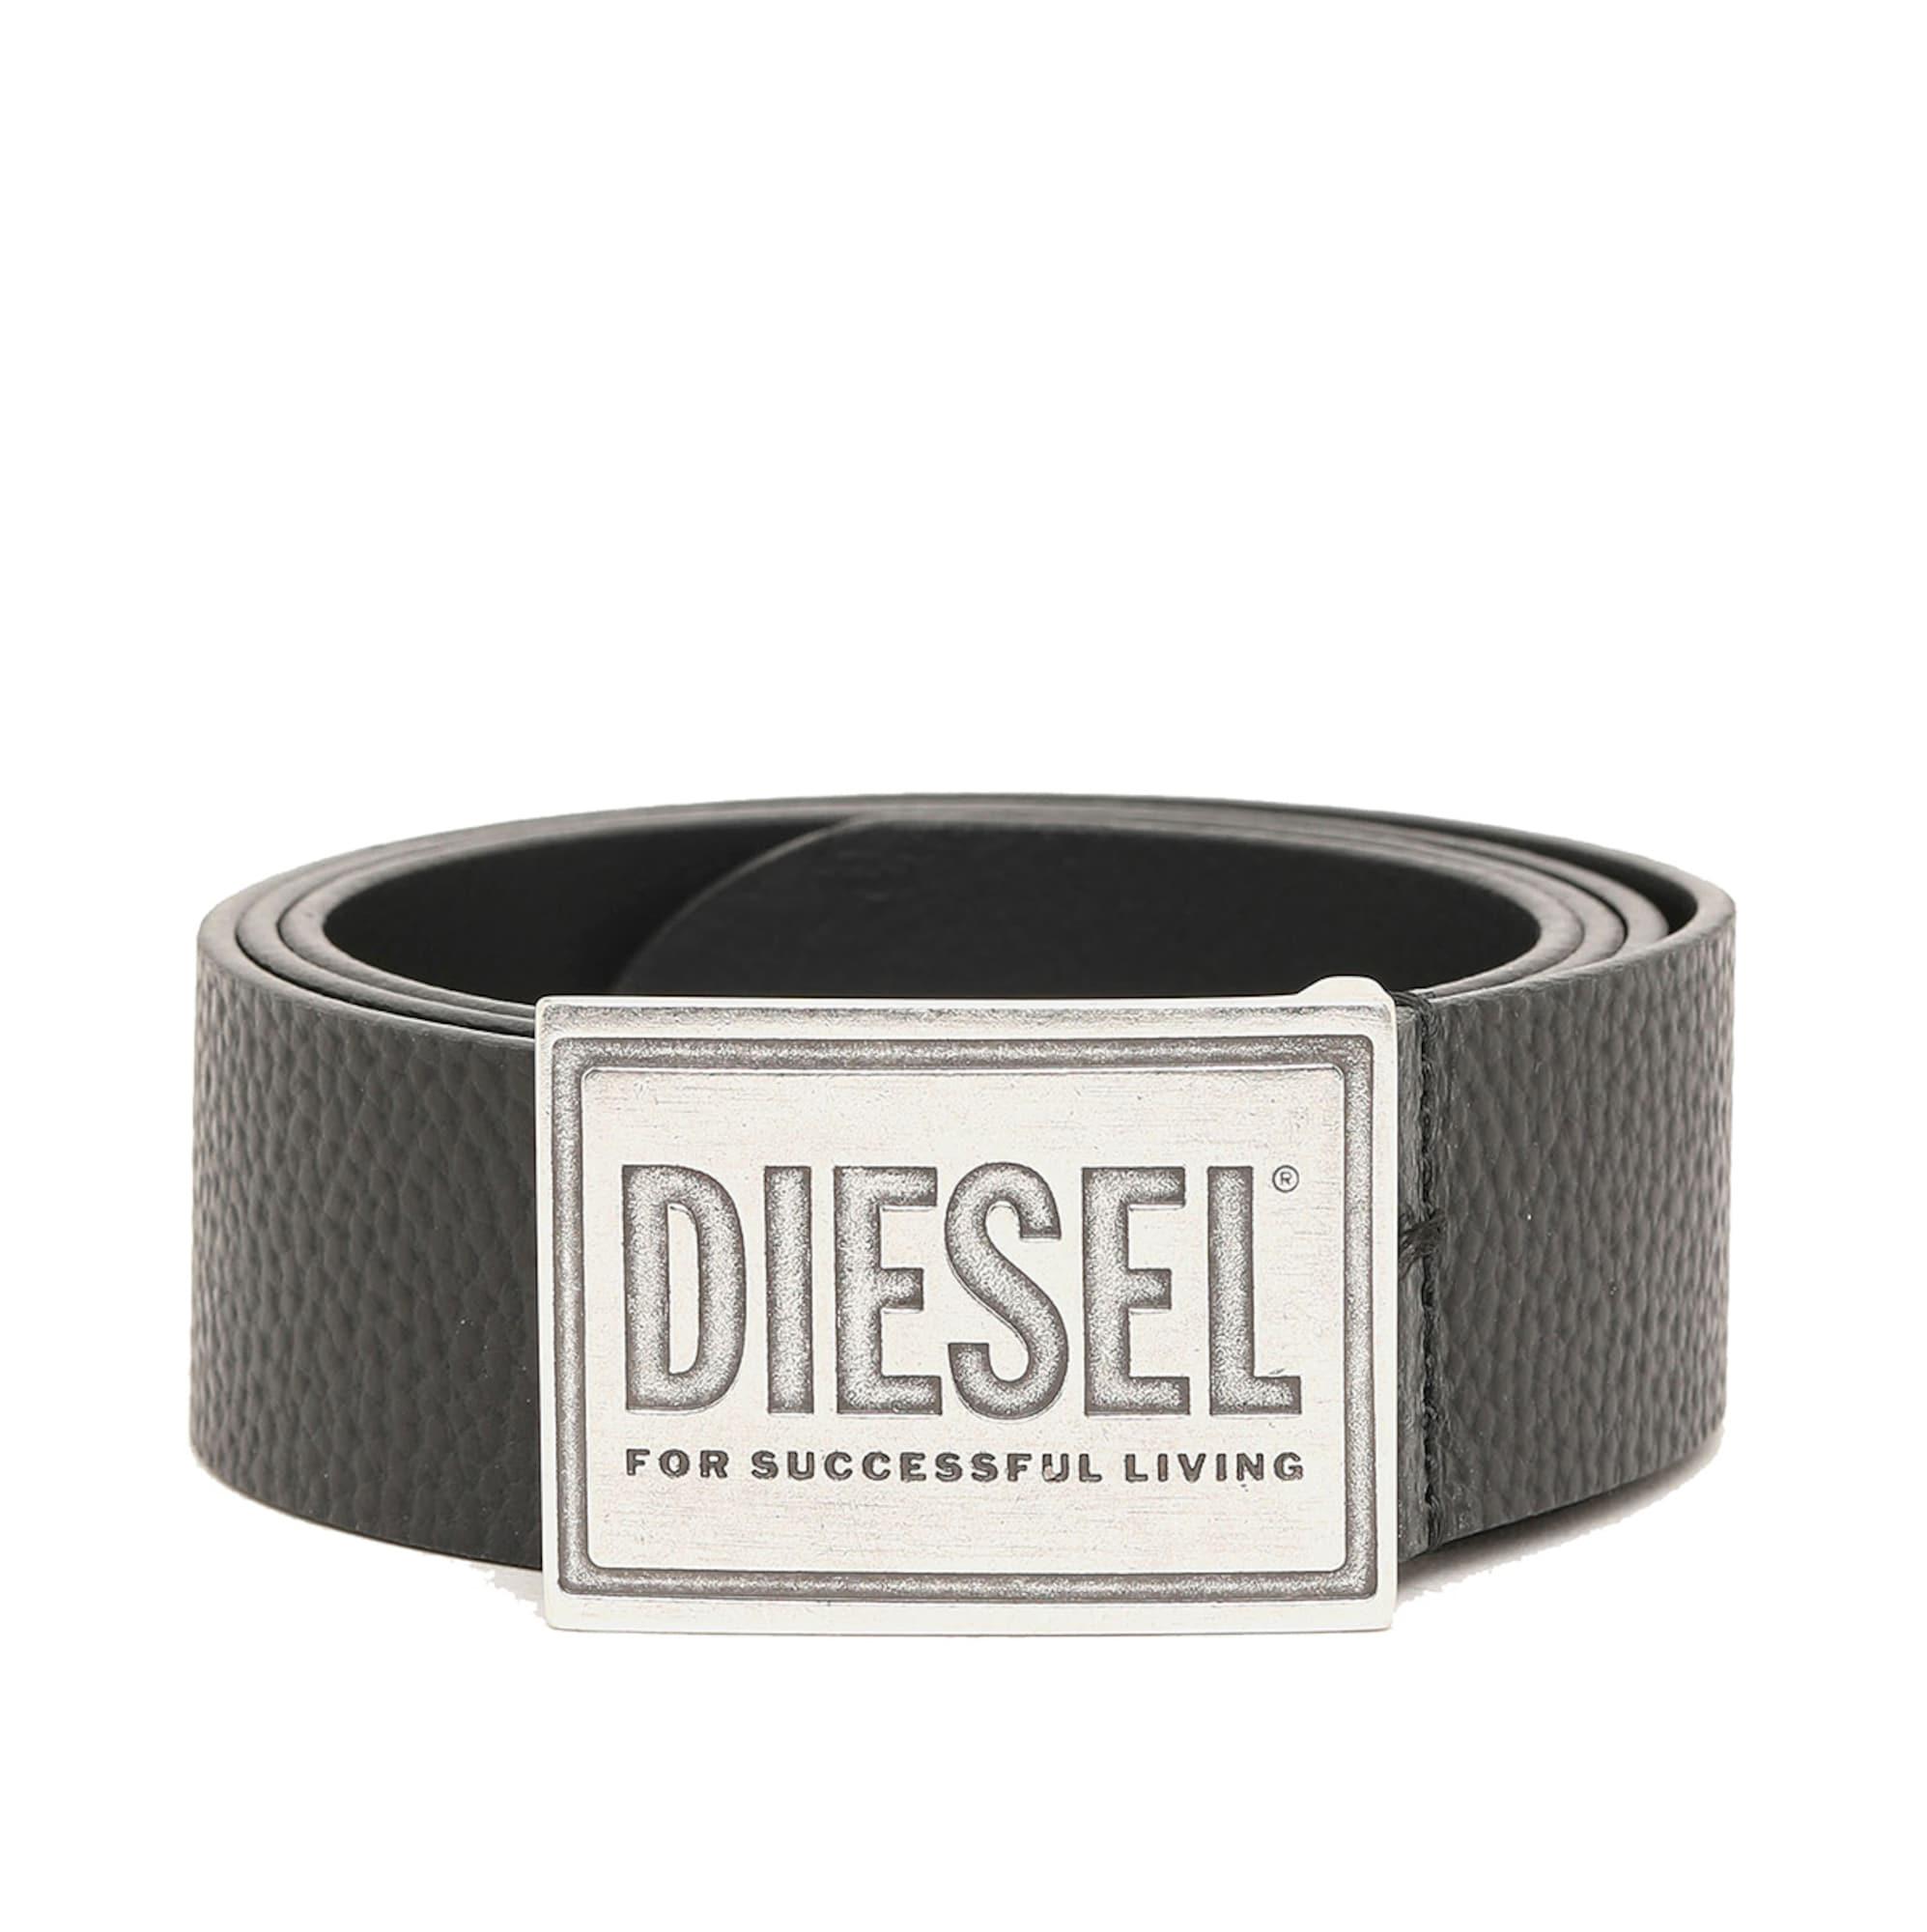 Diesel Ceinture 'B-GRAIN'  - Noir - Taille: 90 - male